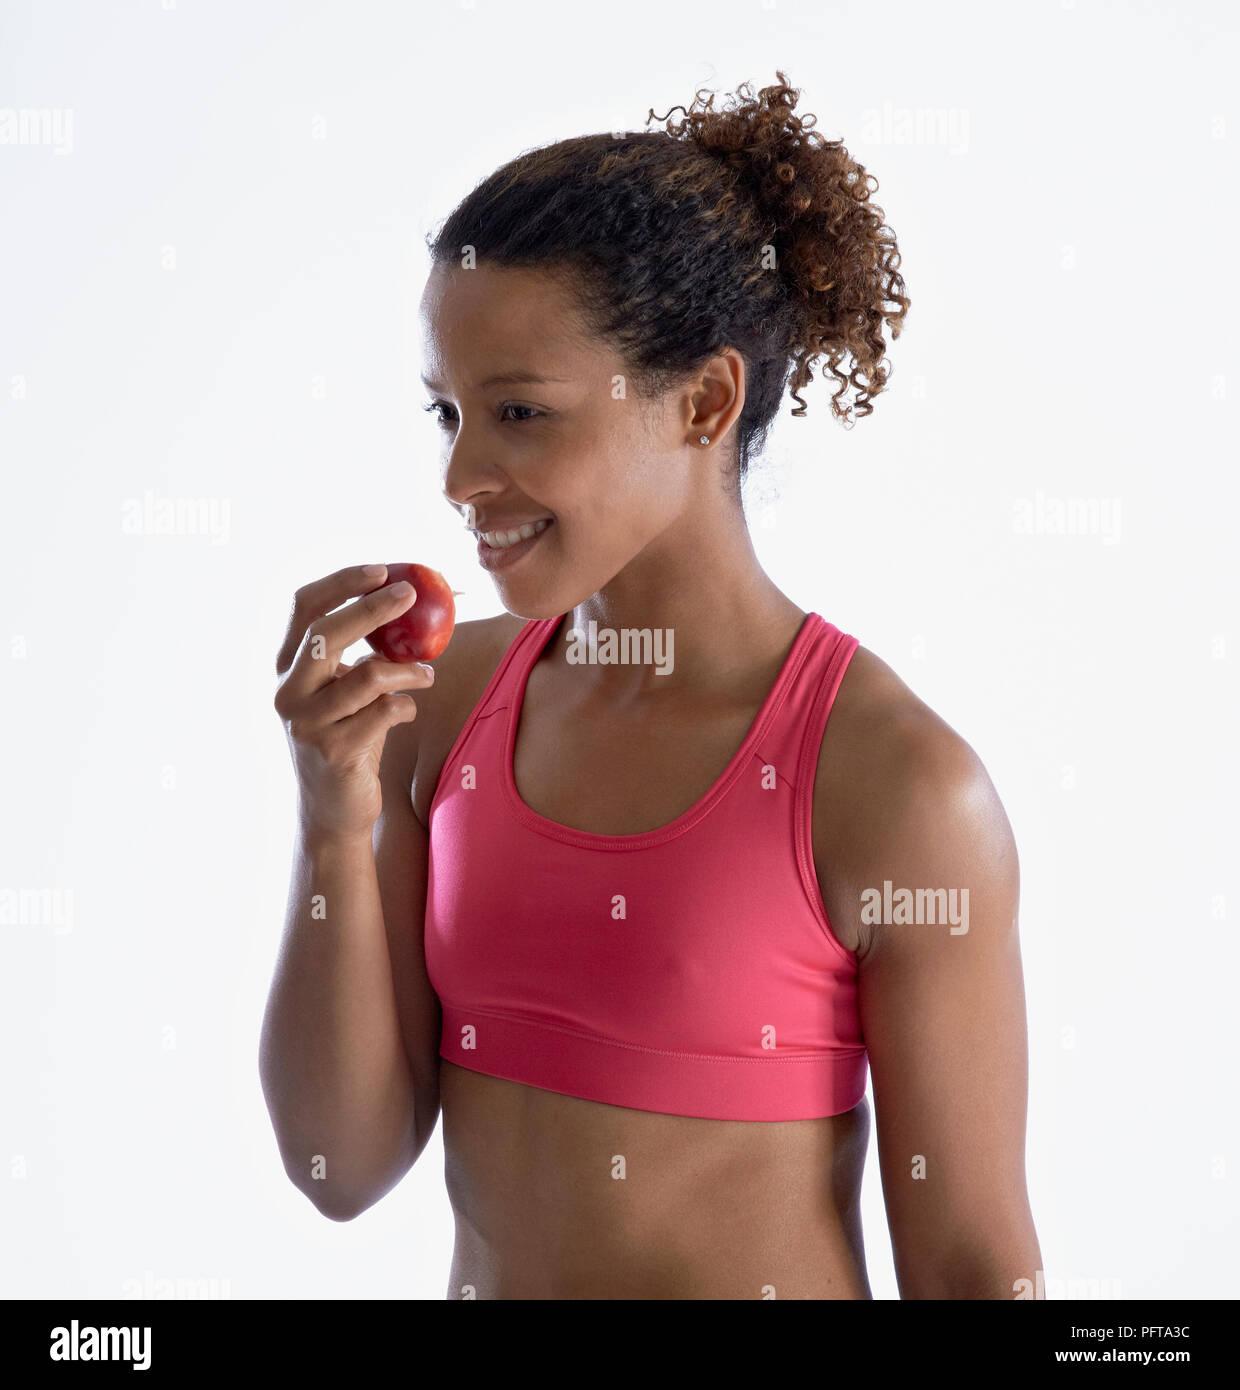 Woman in crop top eating apple - Stock Image